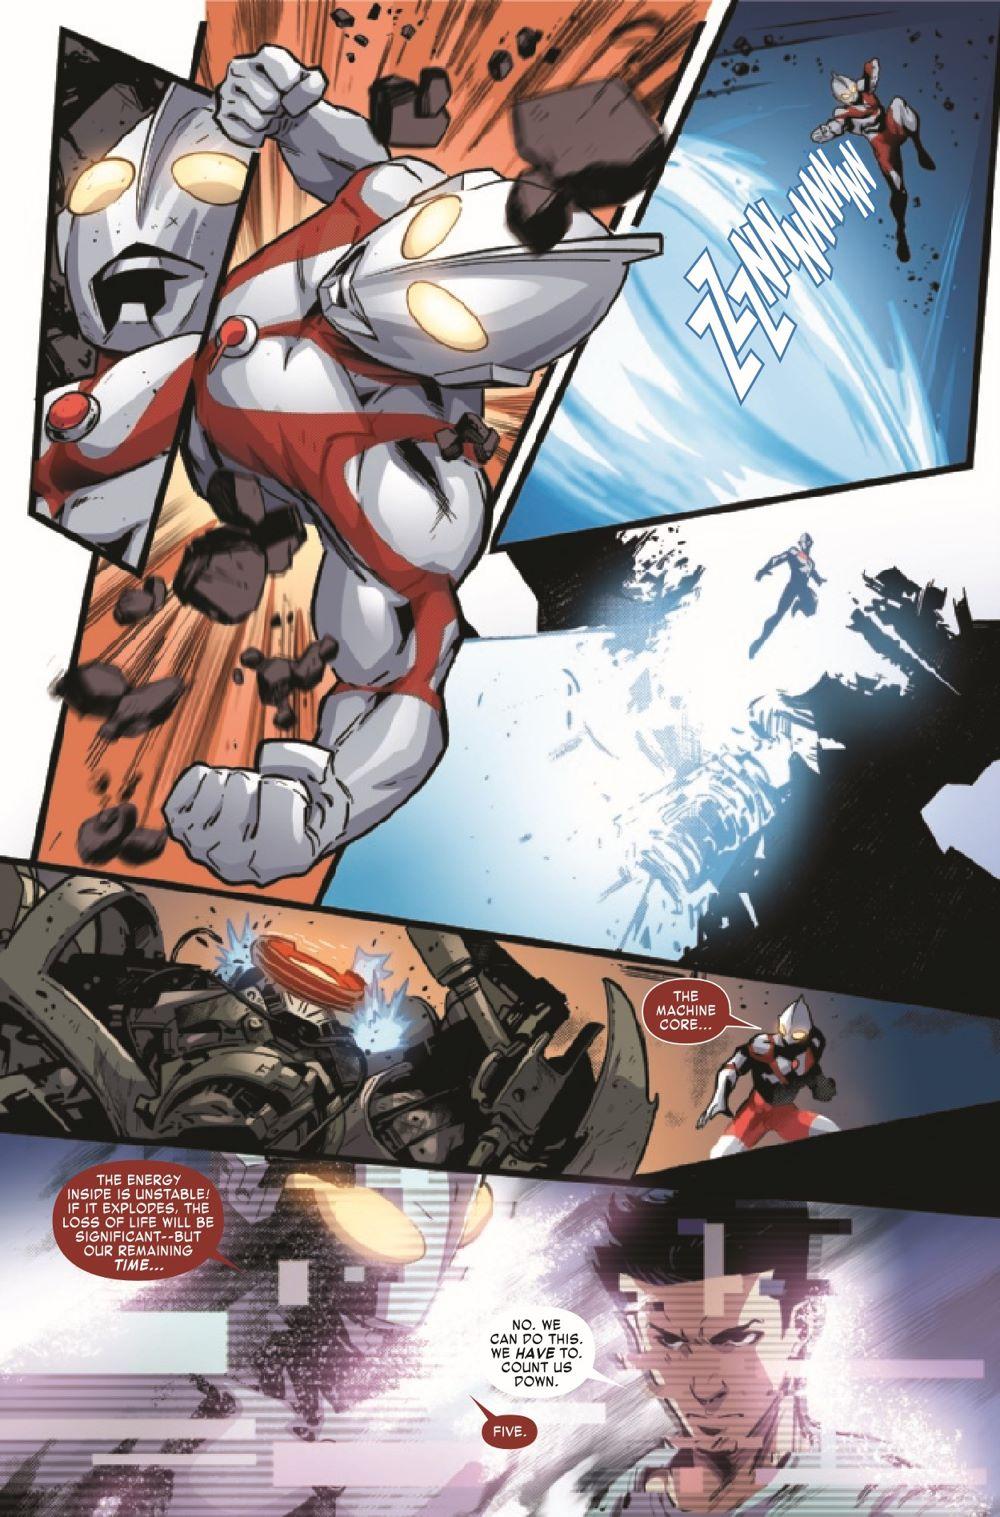 ULTRAMANTRIALS2021003_Preview-4 ComicList Previews: TRIALS OF ULTRAMAN #3 (OF 5)